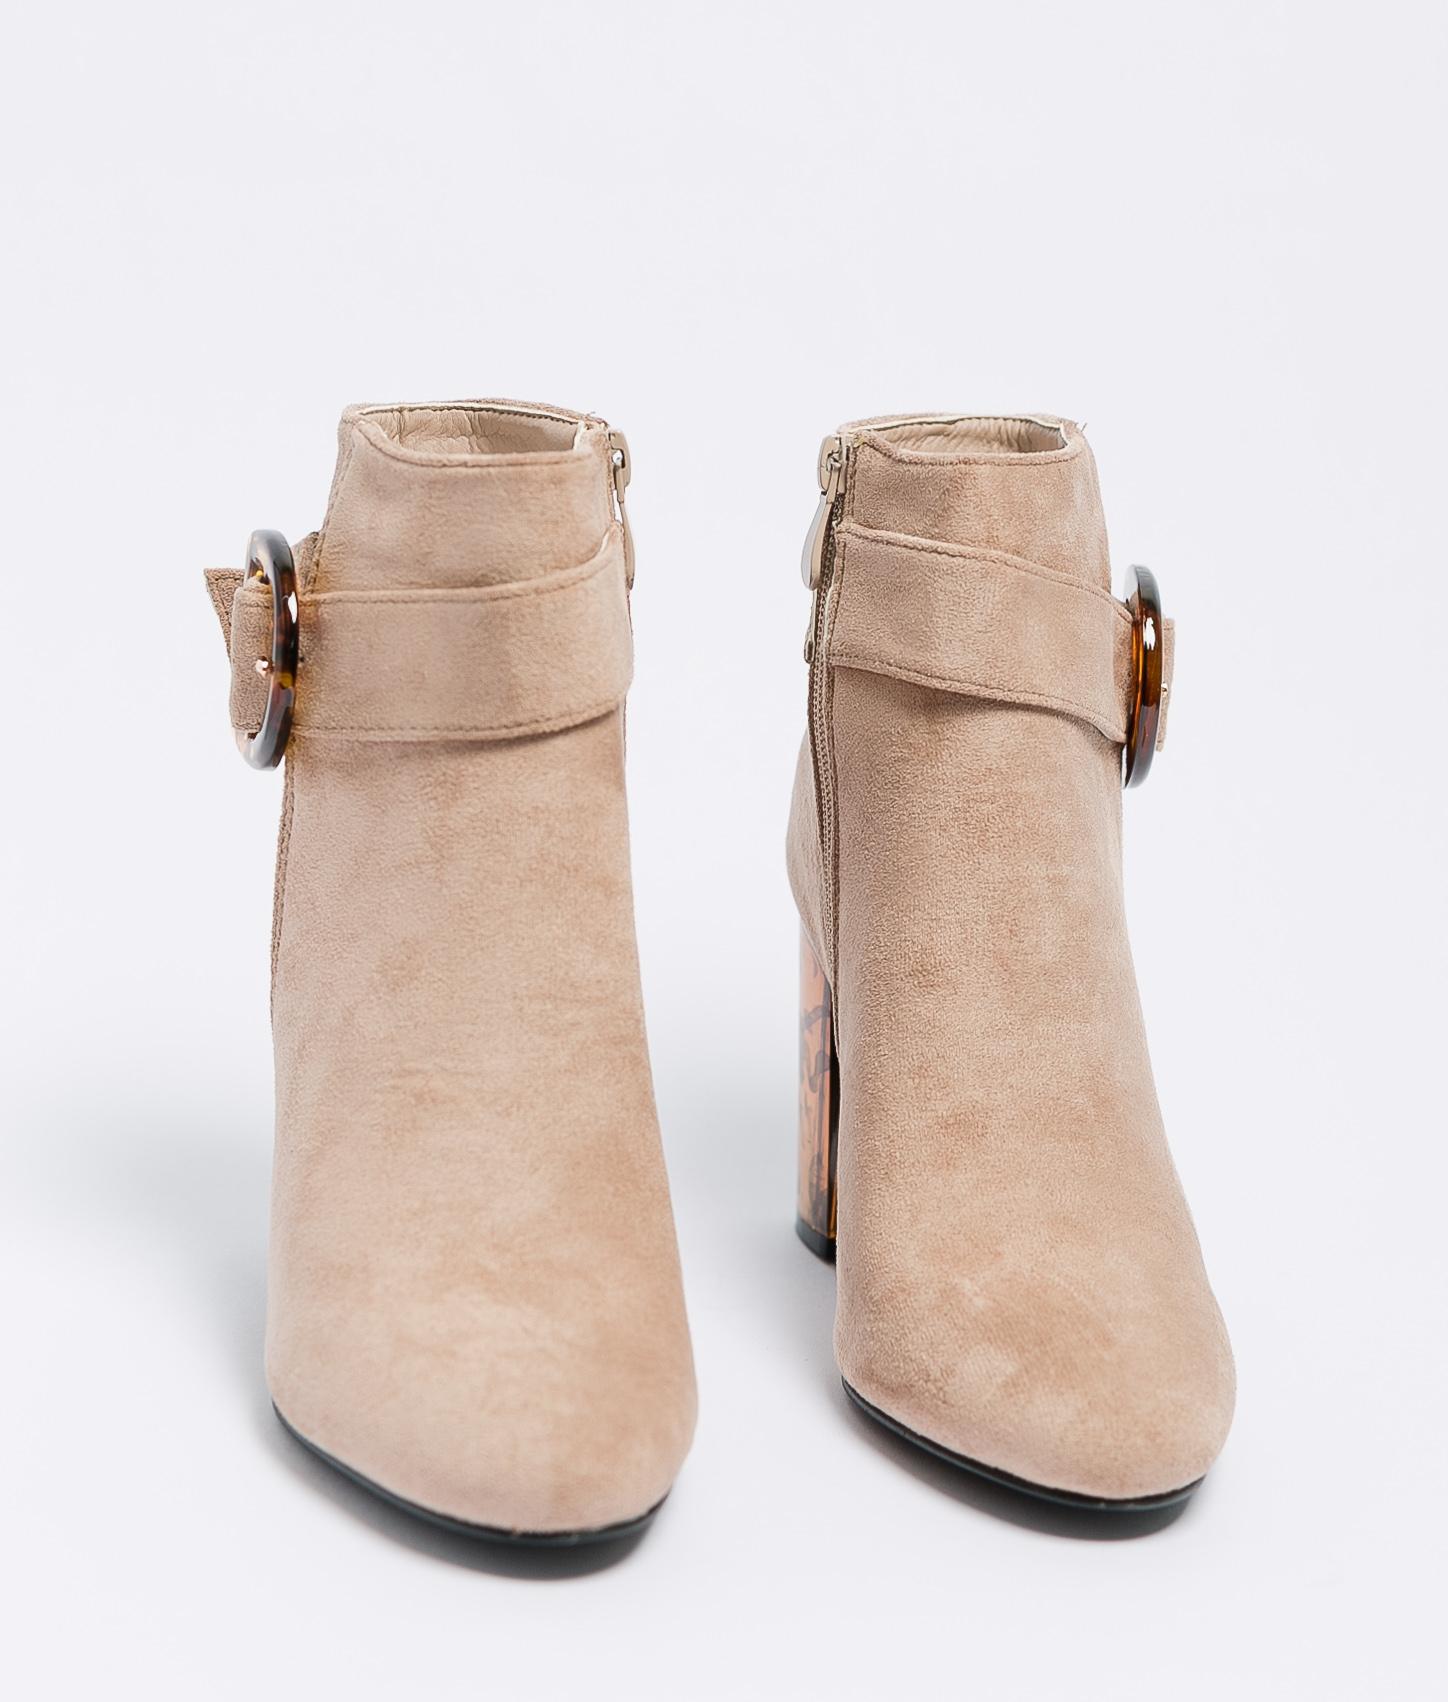 Boot Petite Daire - Kaki